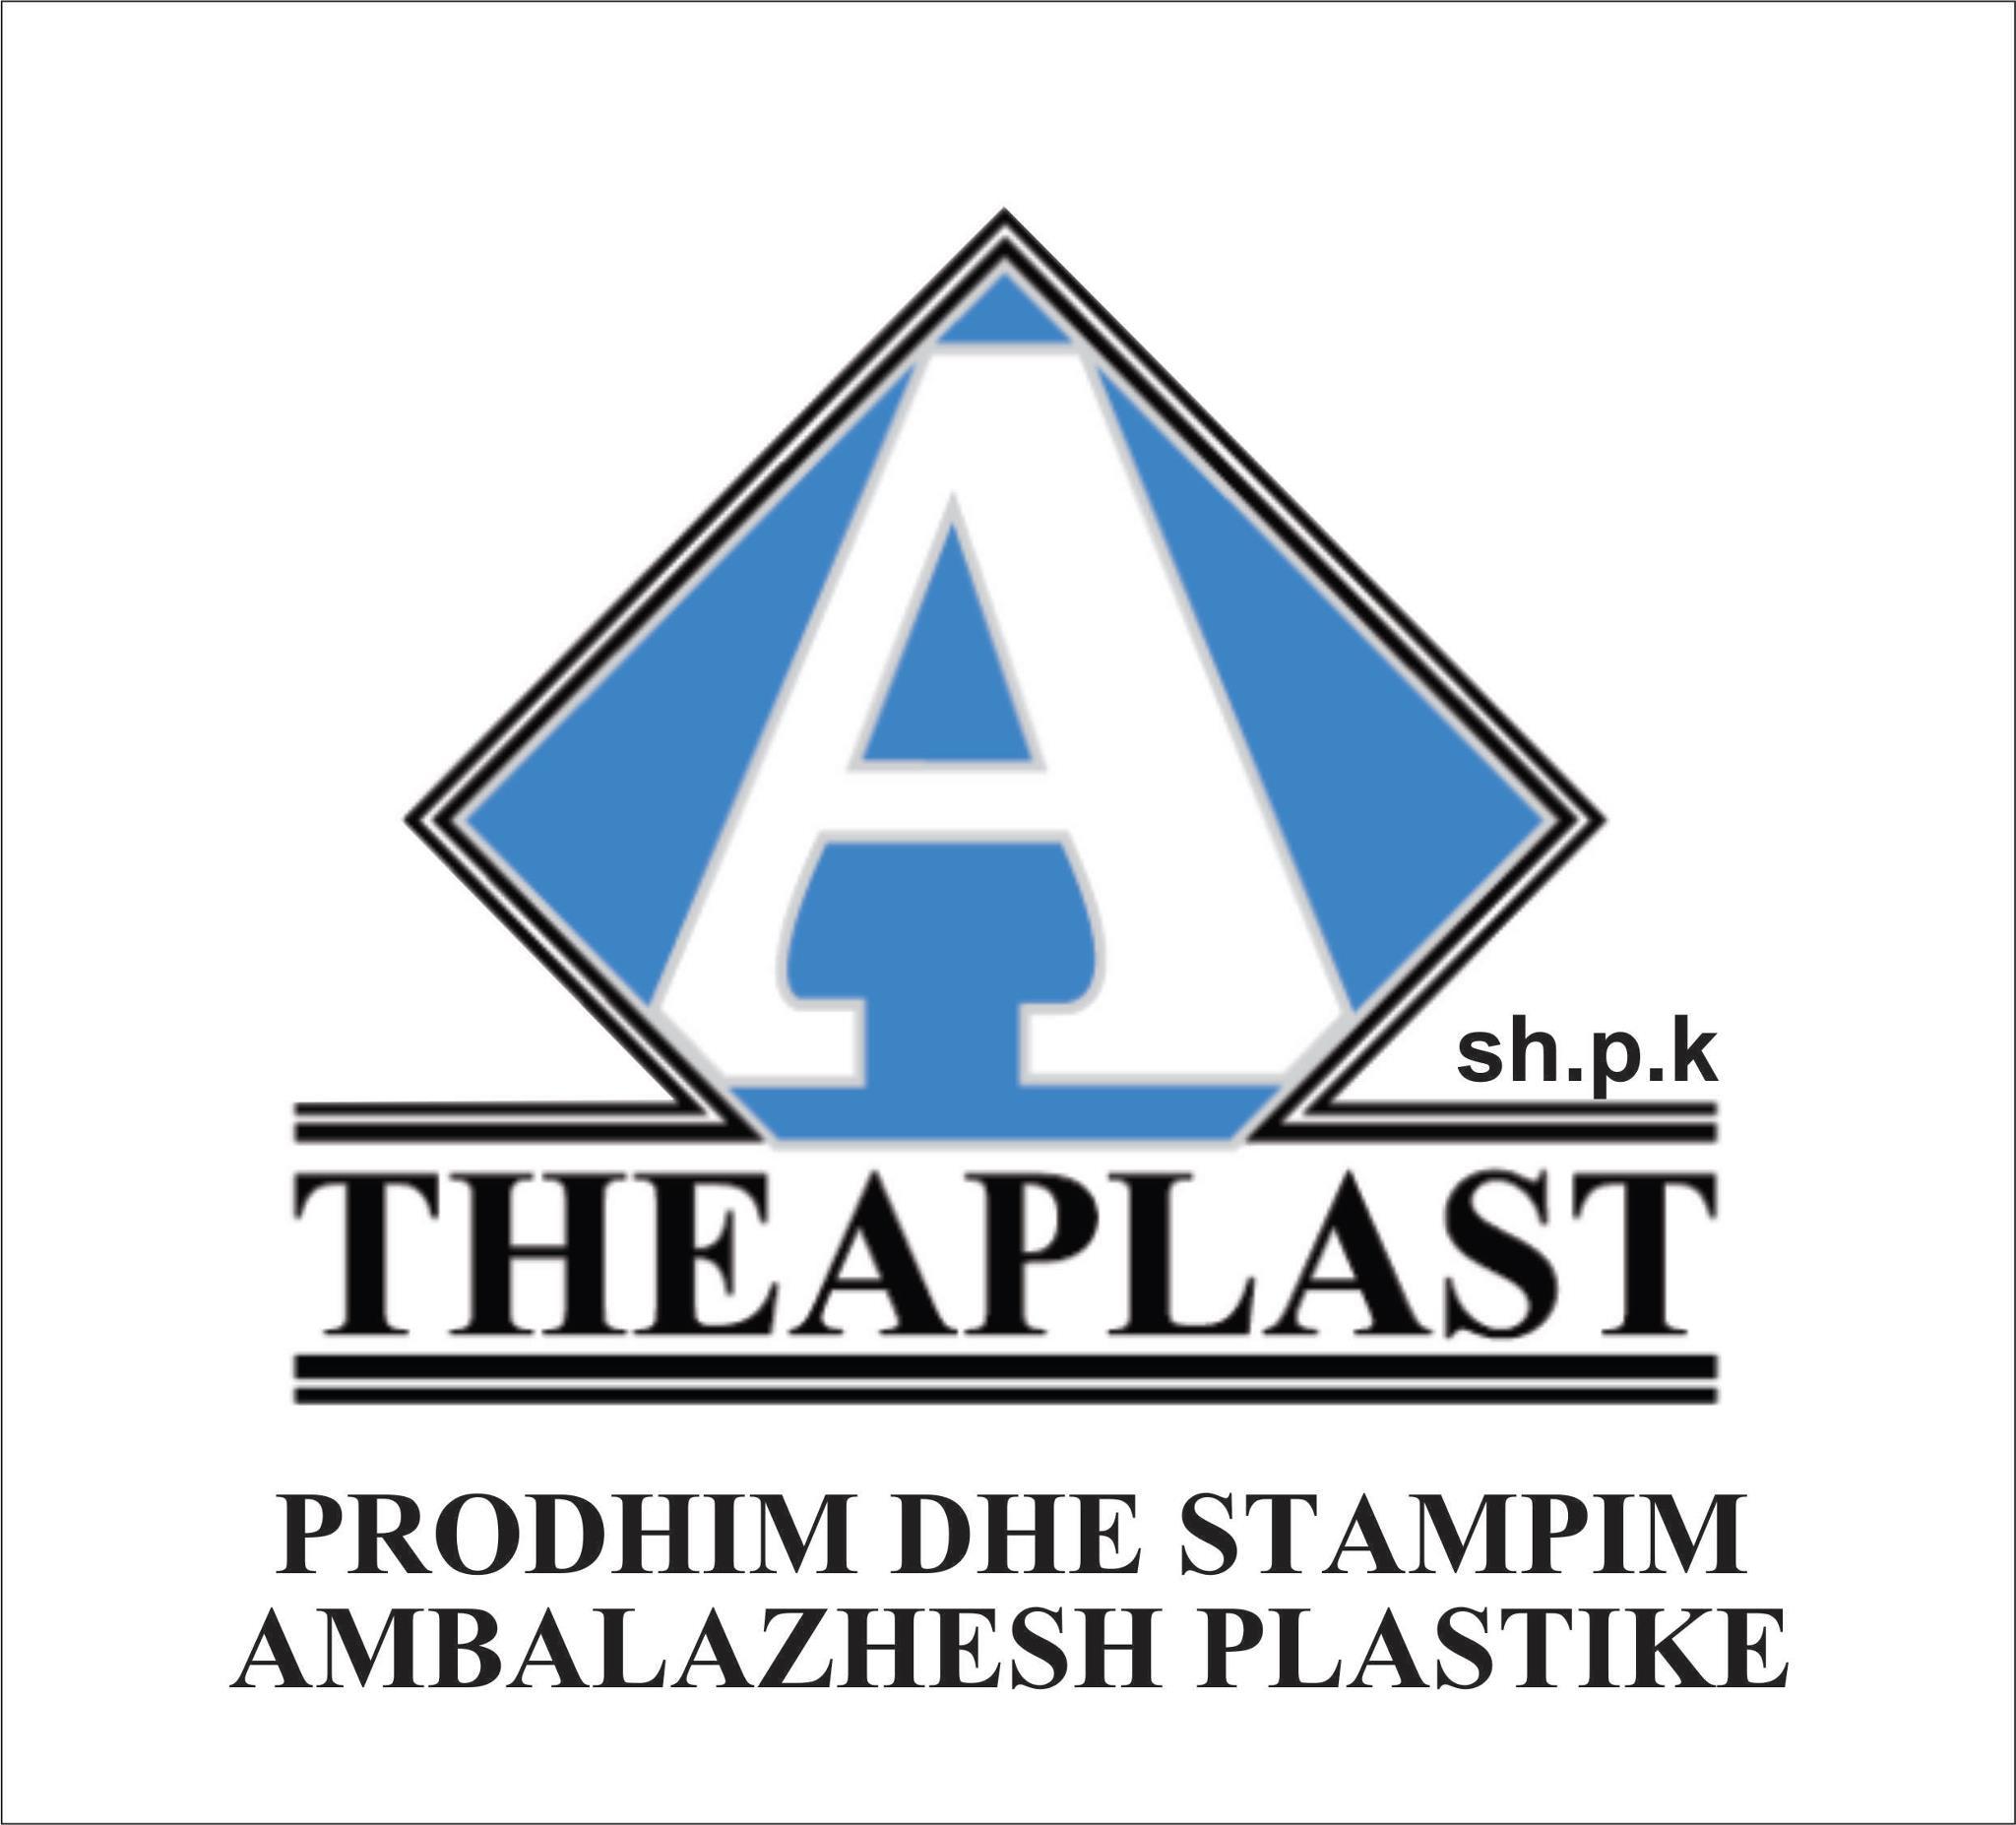 TheaPlast